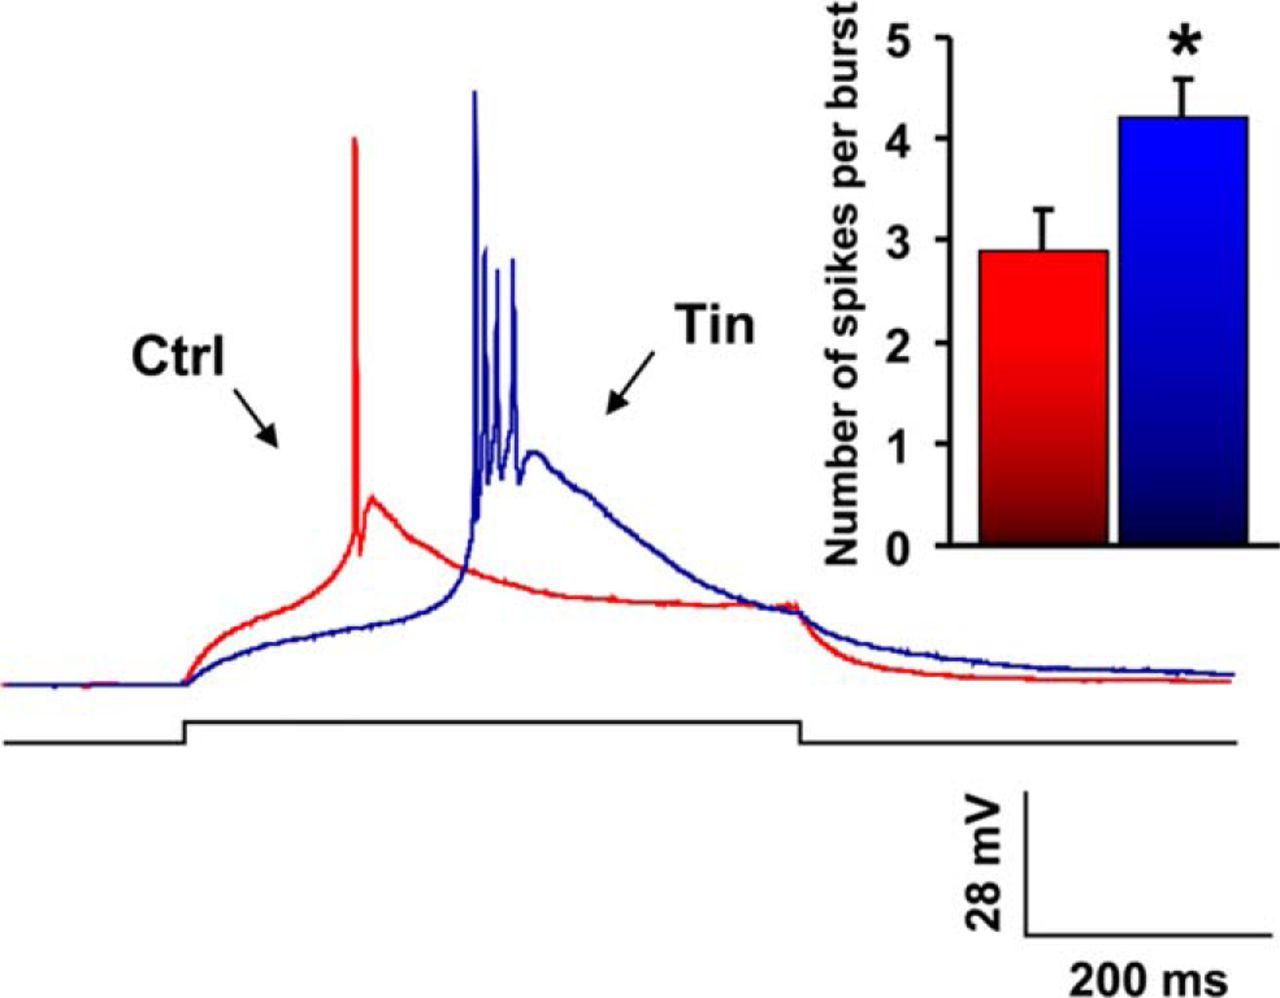 Enhanced GABAA-Mediated Tonic Inhibition in Auditory